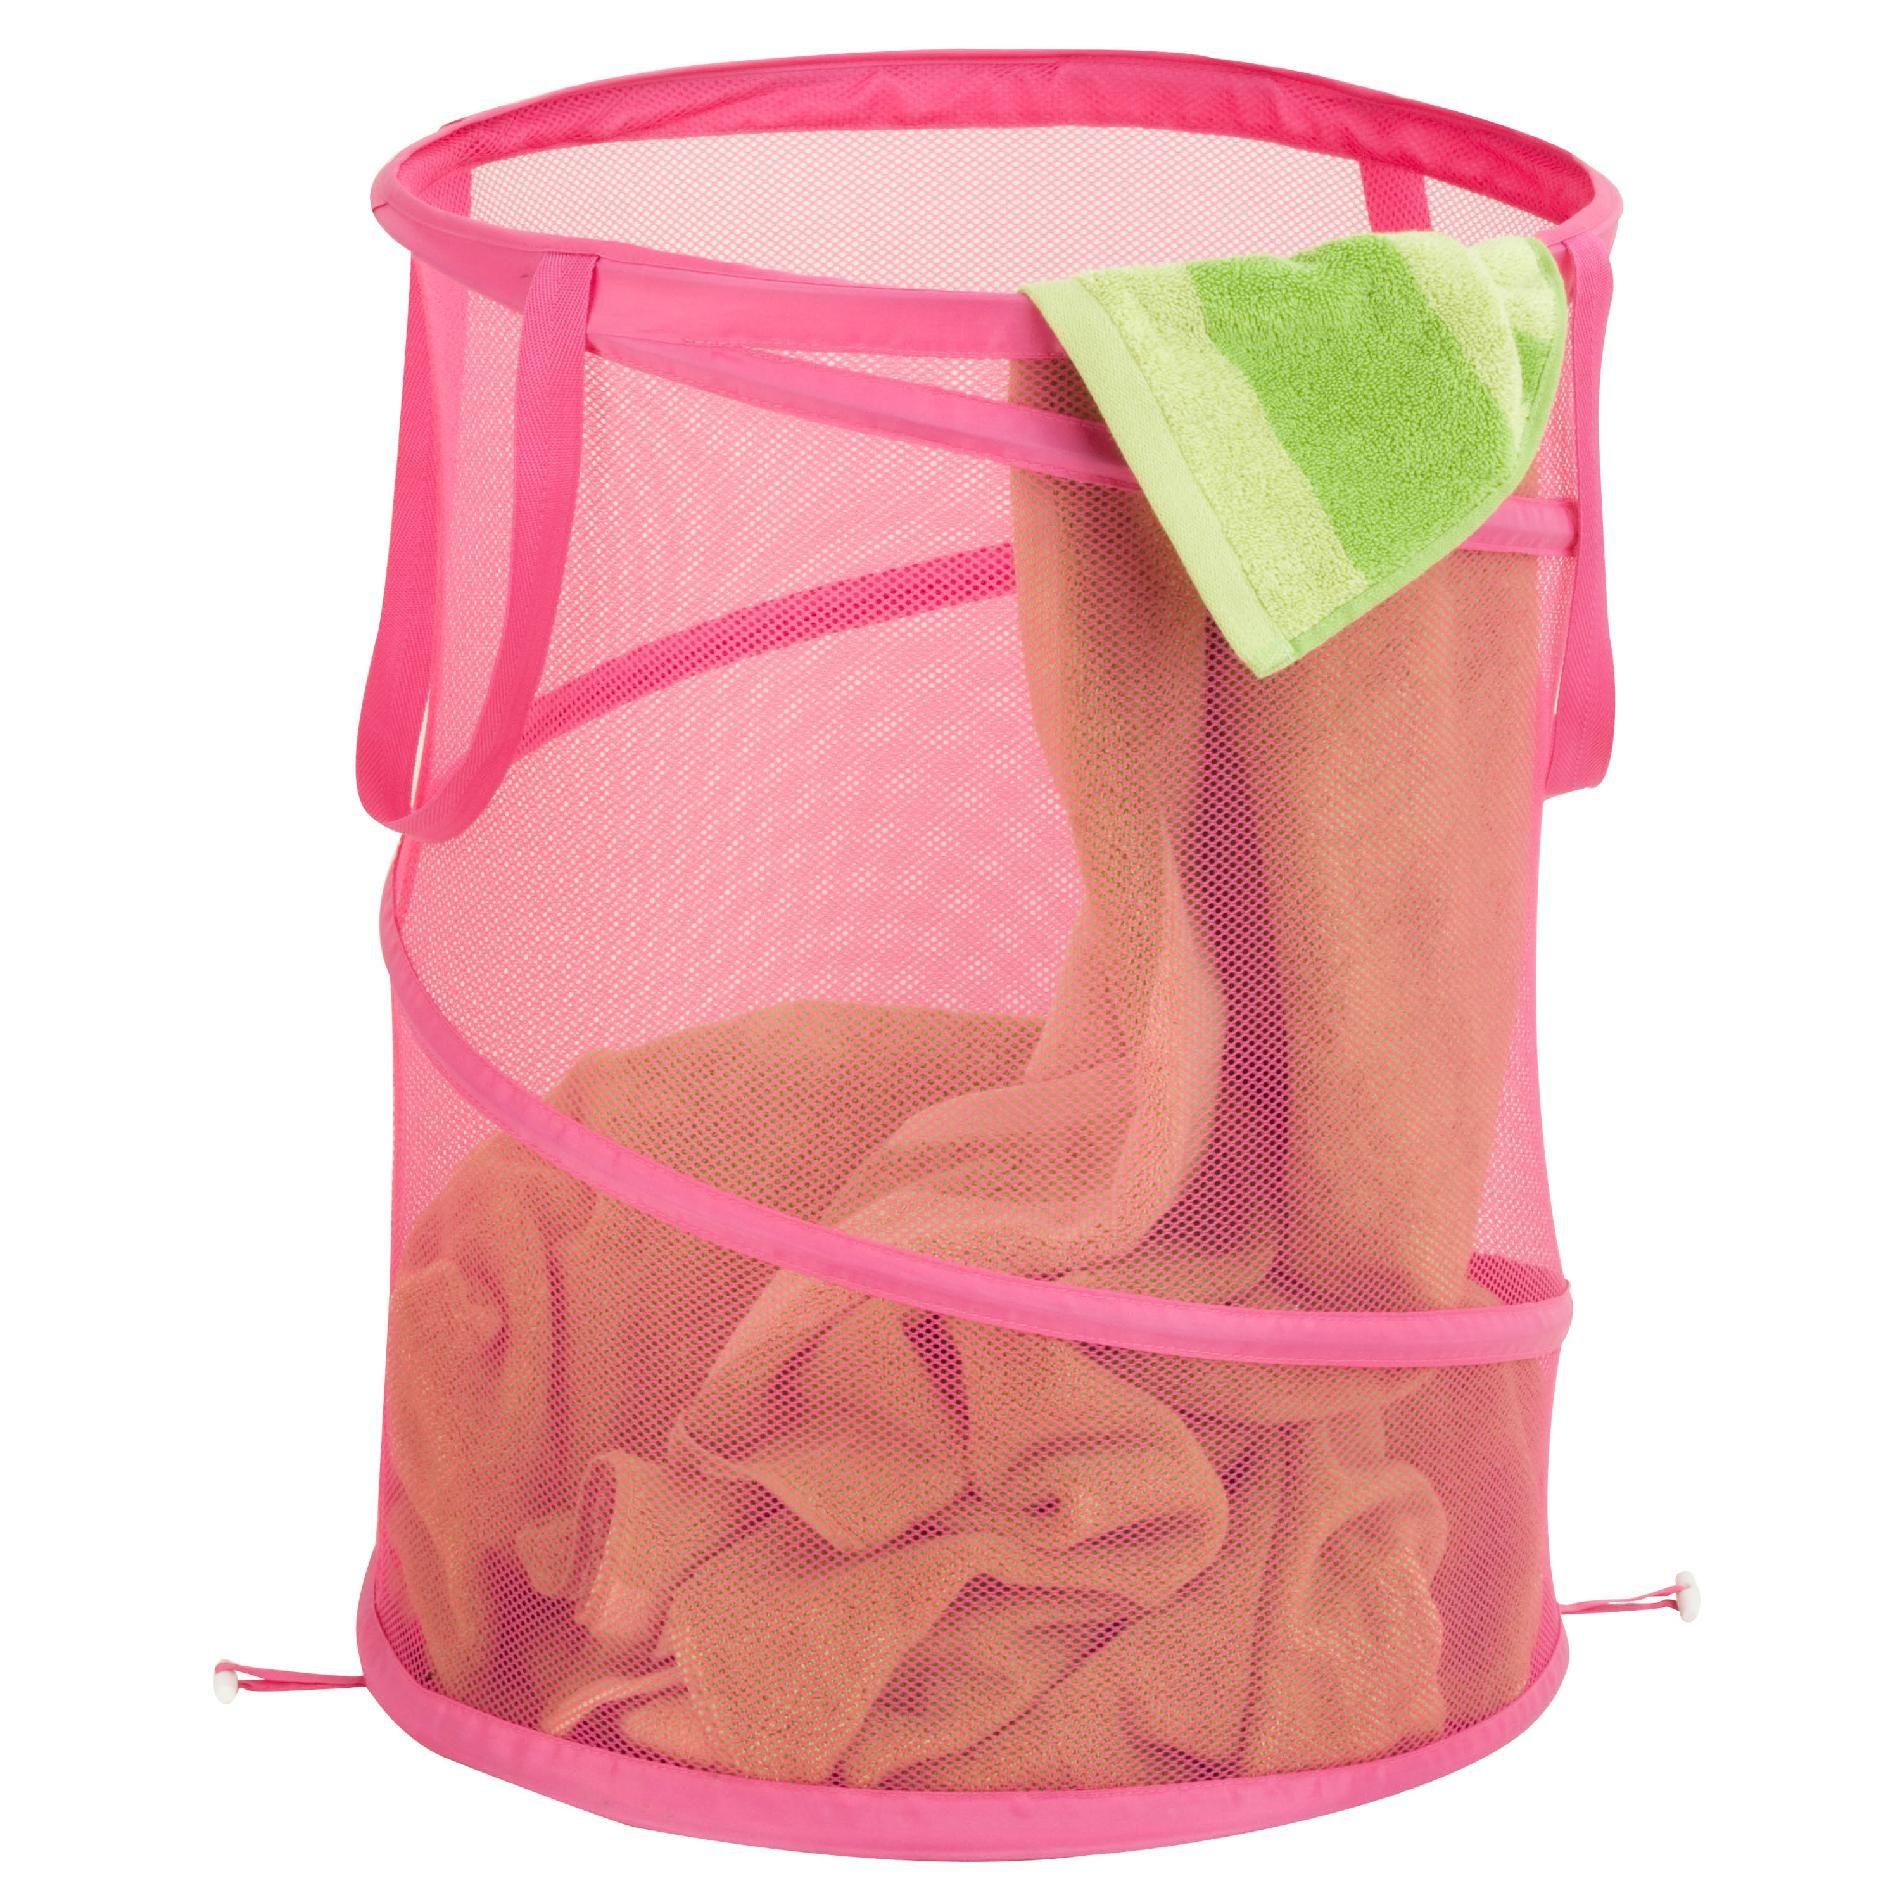 Pink Plastic Laundry Basket Honey Can Do Large Mesh Pop Open Hamper Pink  Products  Pinterest